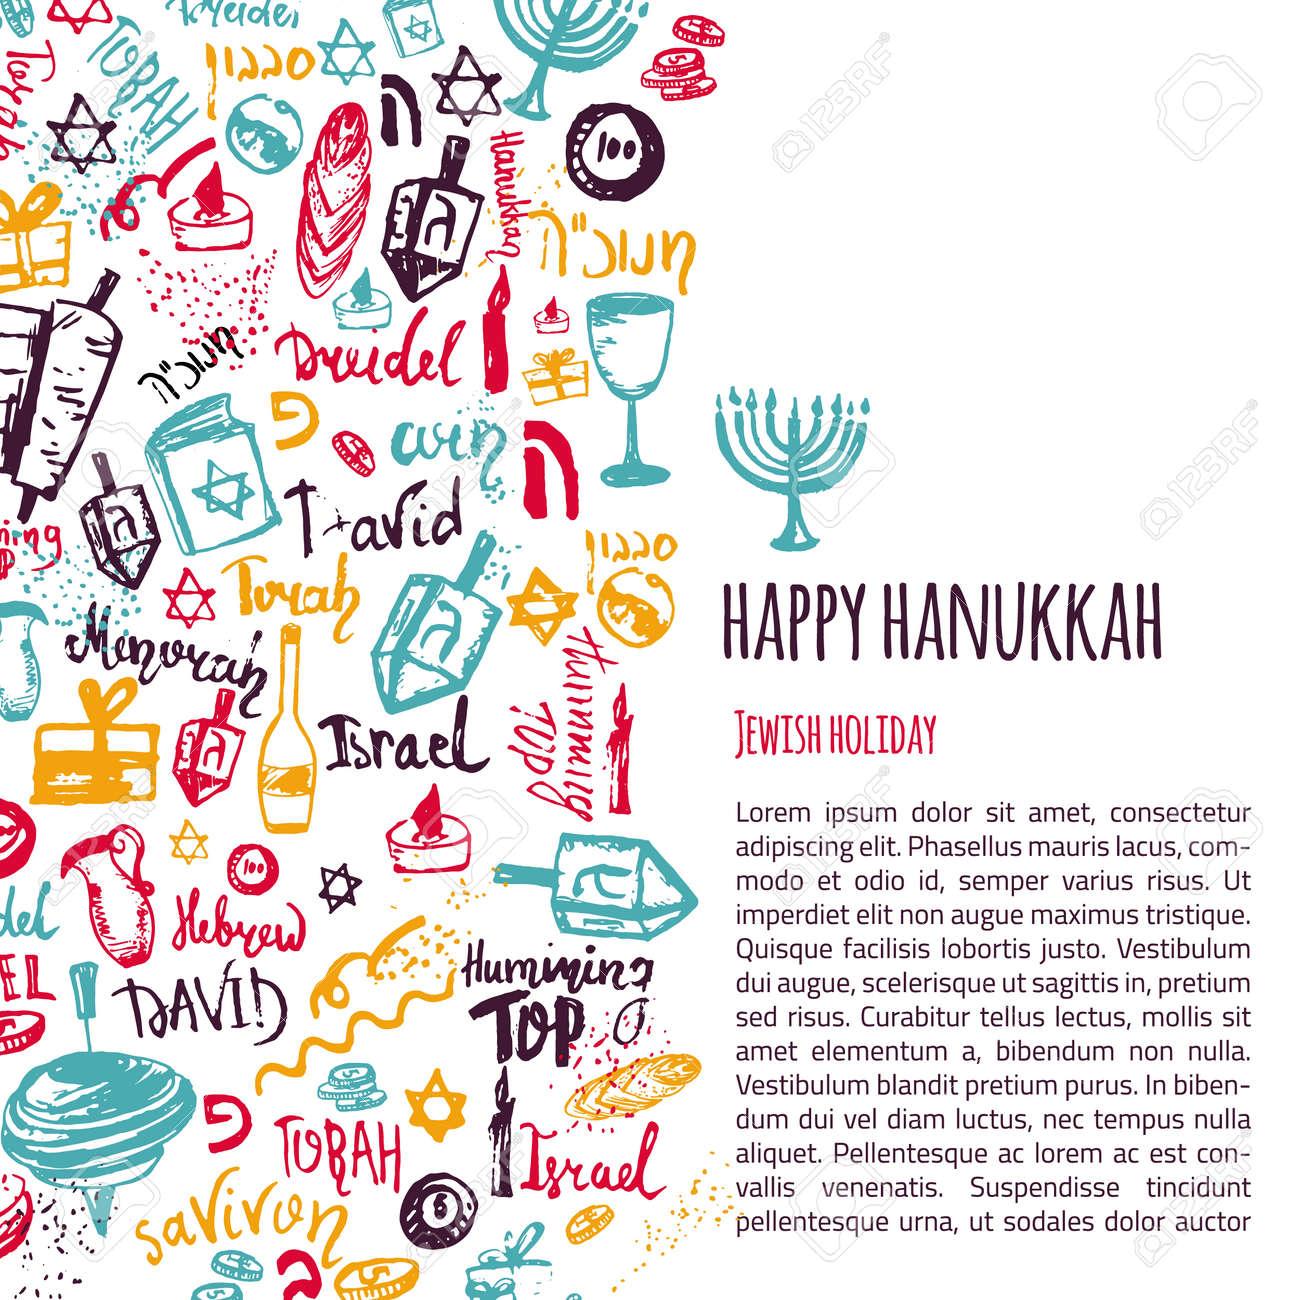 Happy hanukkah greeting card with hand drawn elements and lettering happy hanukkah greeting card with hand drawn elements and lettering menorah dreidel candle m4hsunfo